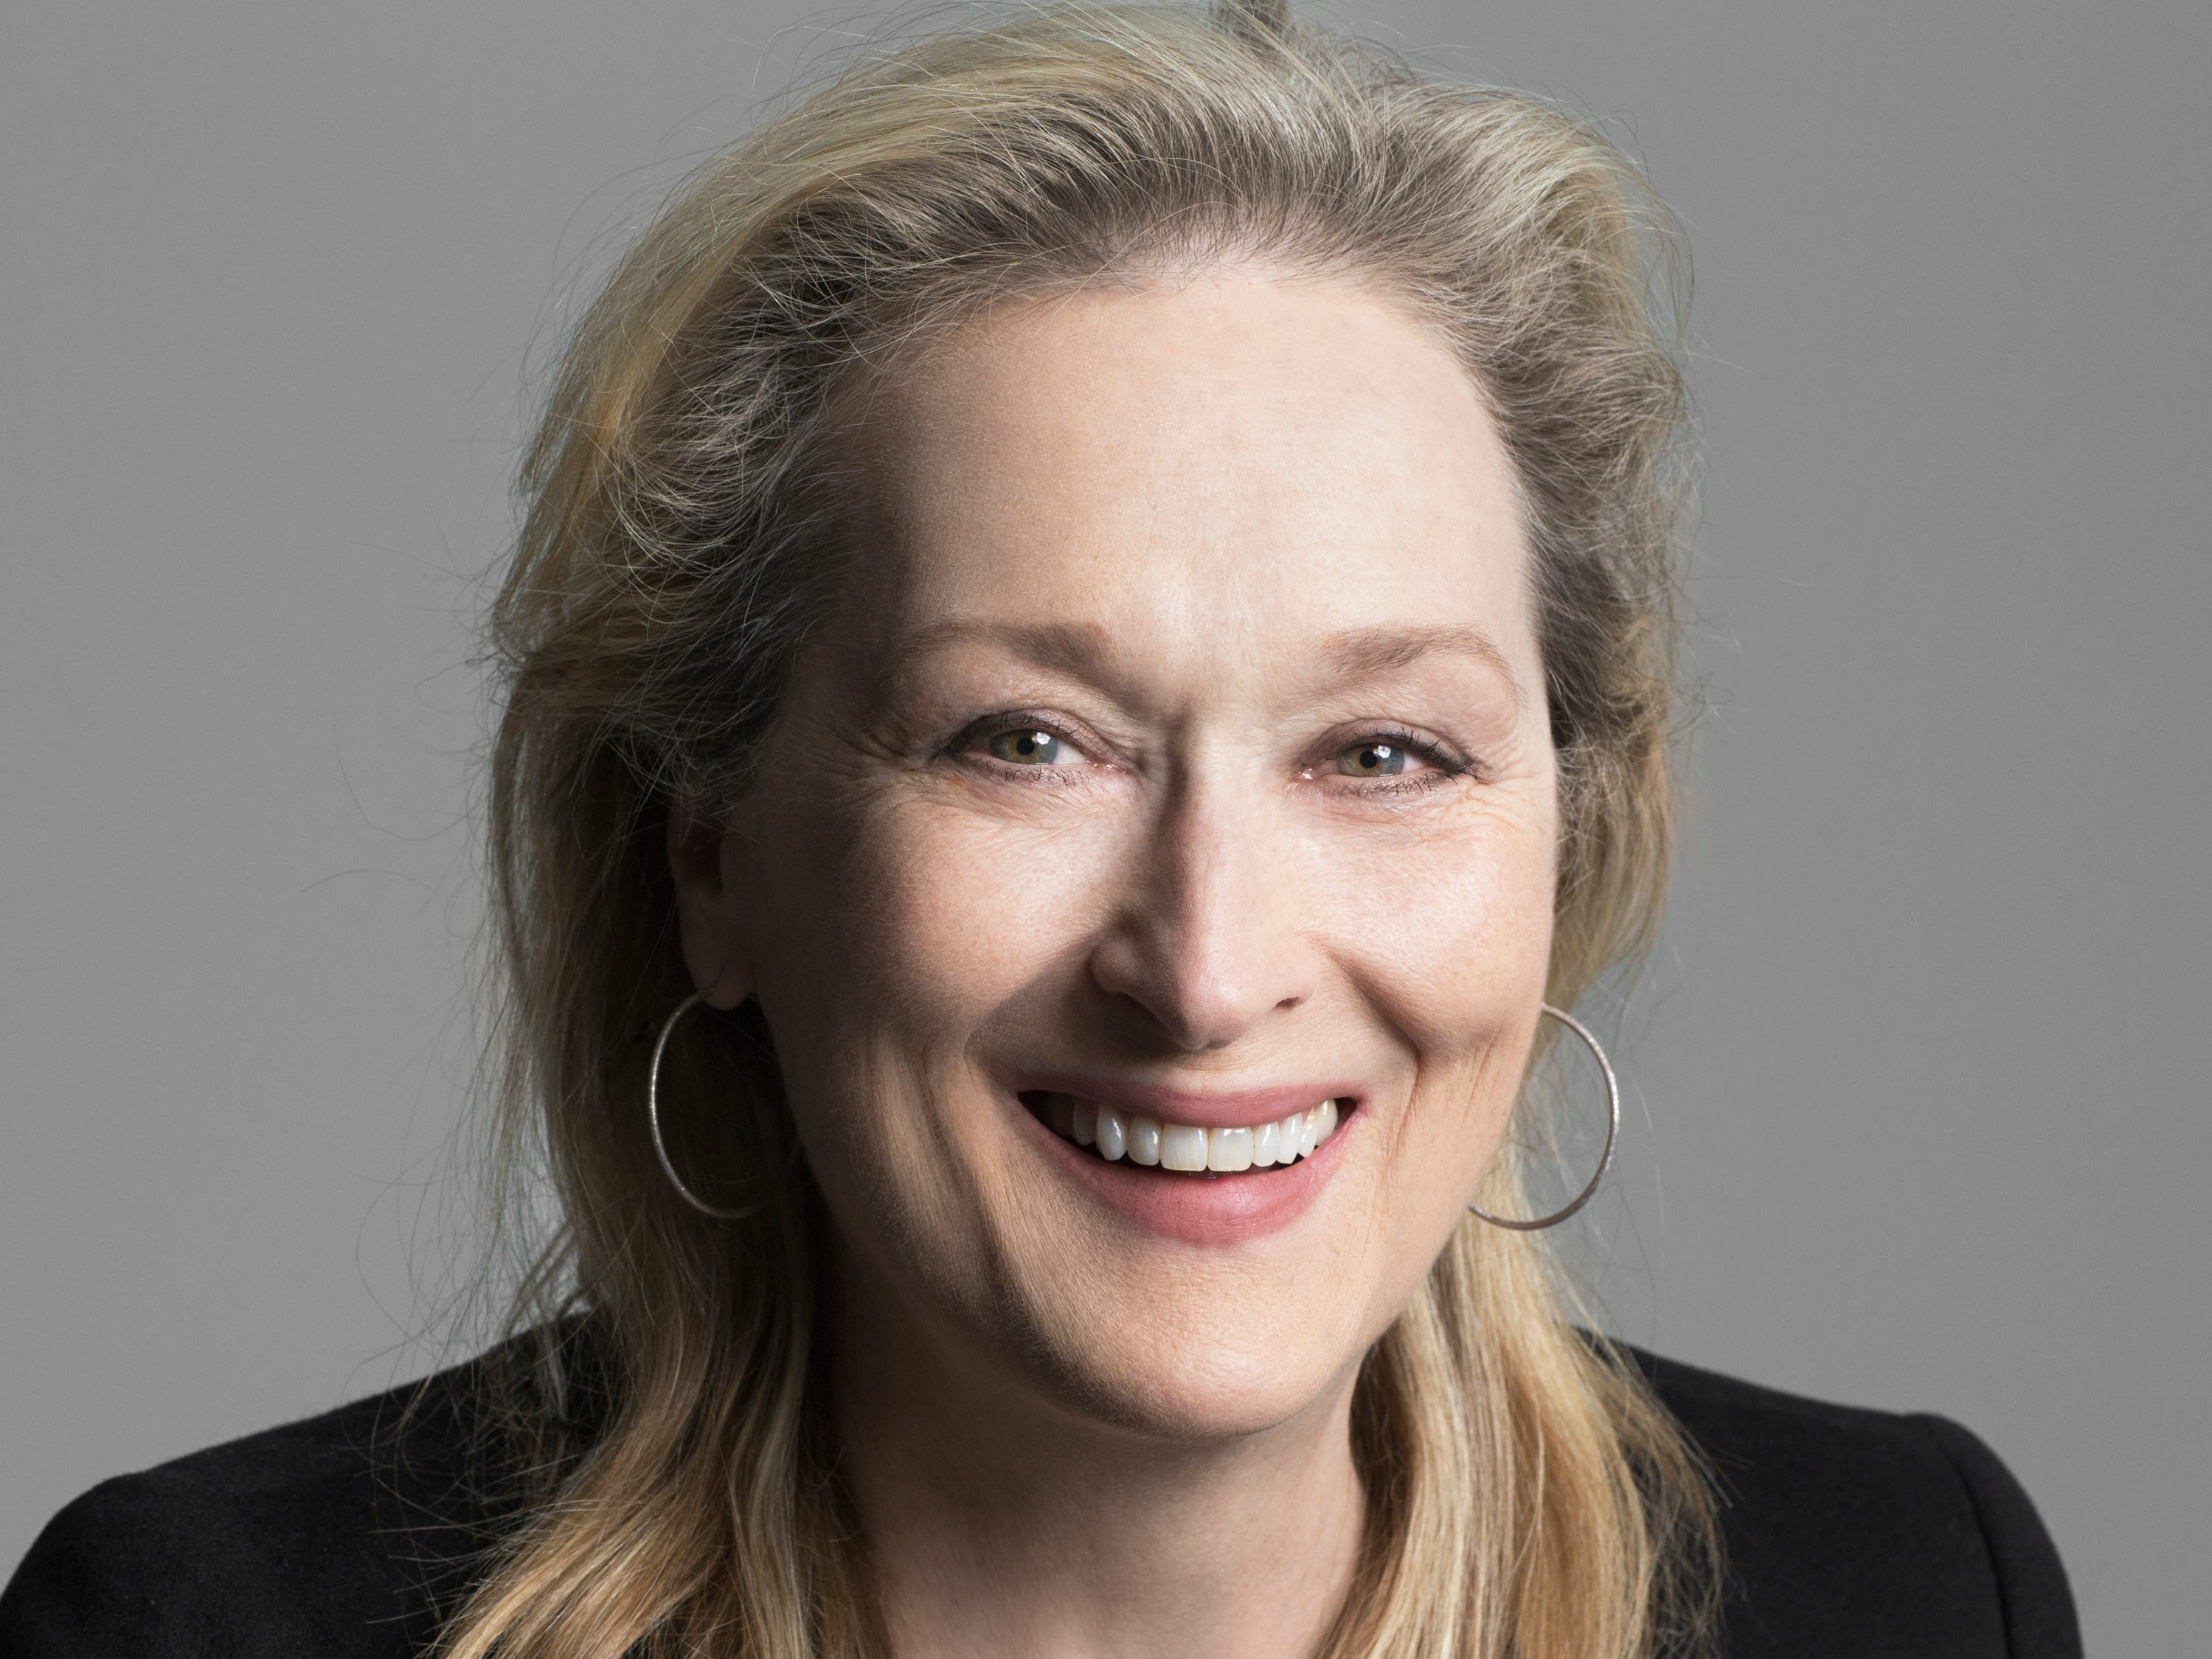 Meryl Streep to headline Montclair Film annual benefit with Stephen Colbert